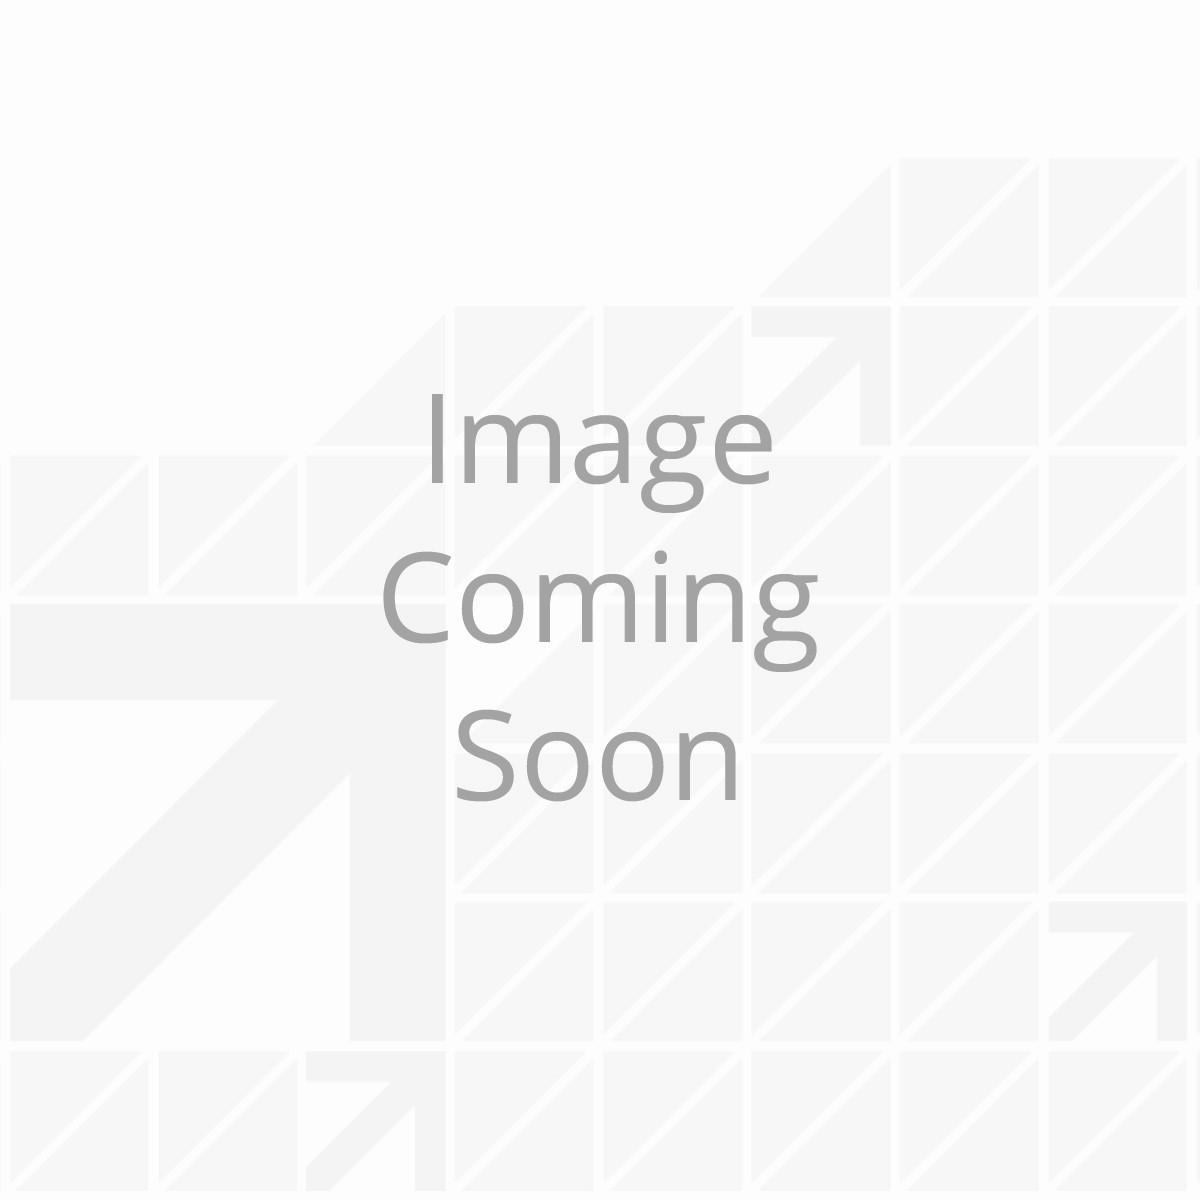 1 4 Quot Hydraulic Fitting Swivel 90 176 Elbow Fs6500 04 04